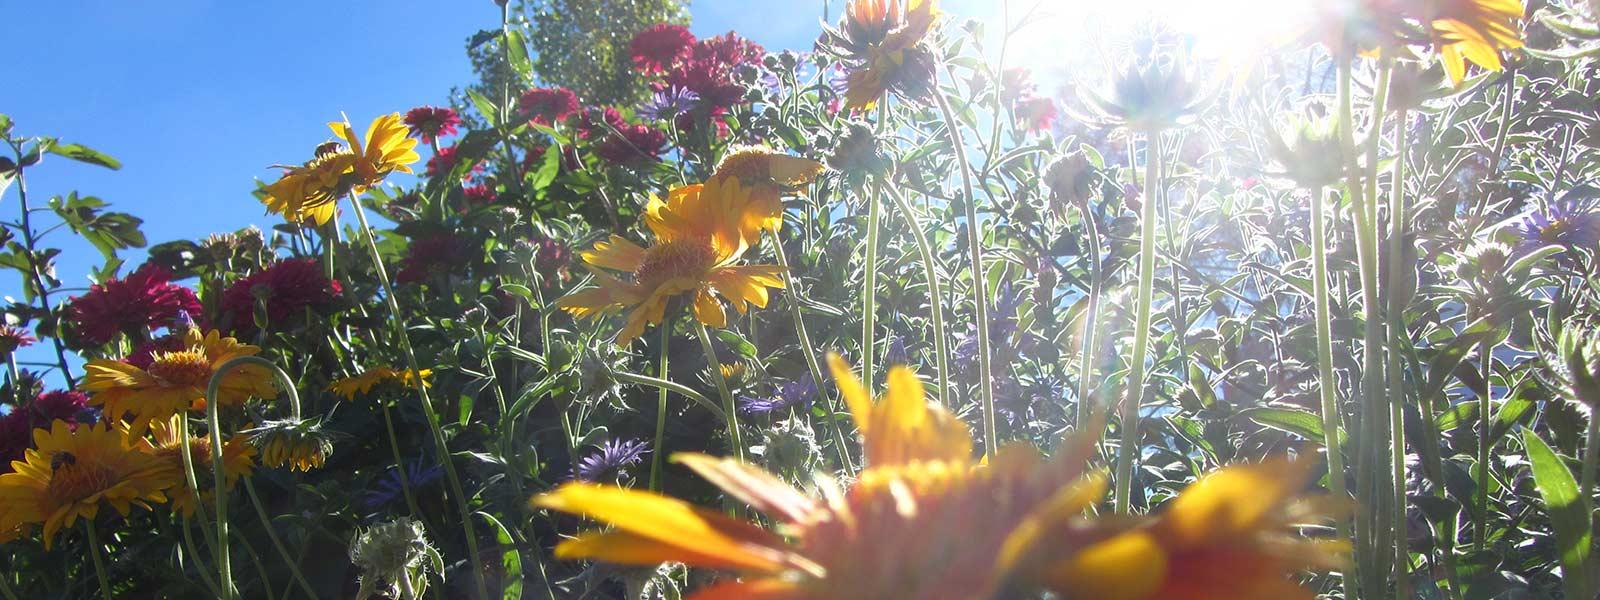 Sunlight filtered through flowers